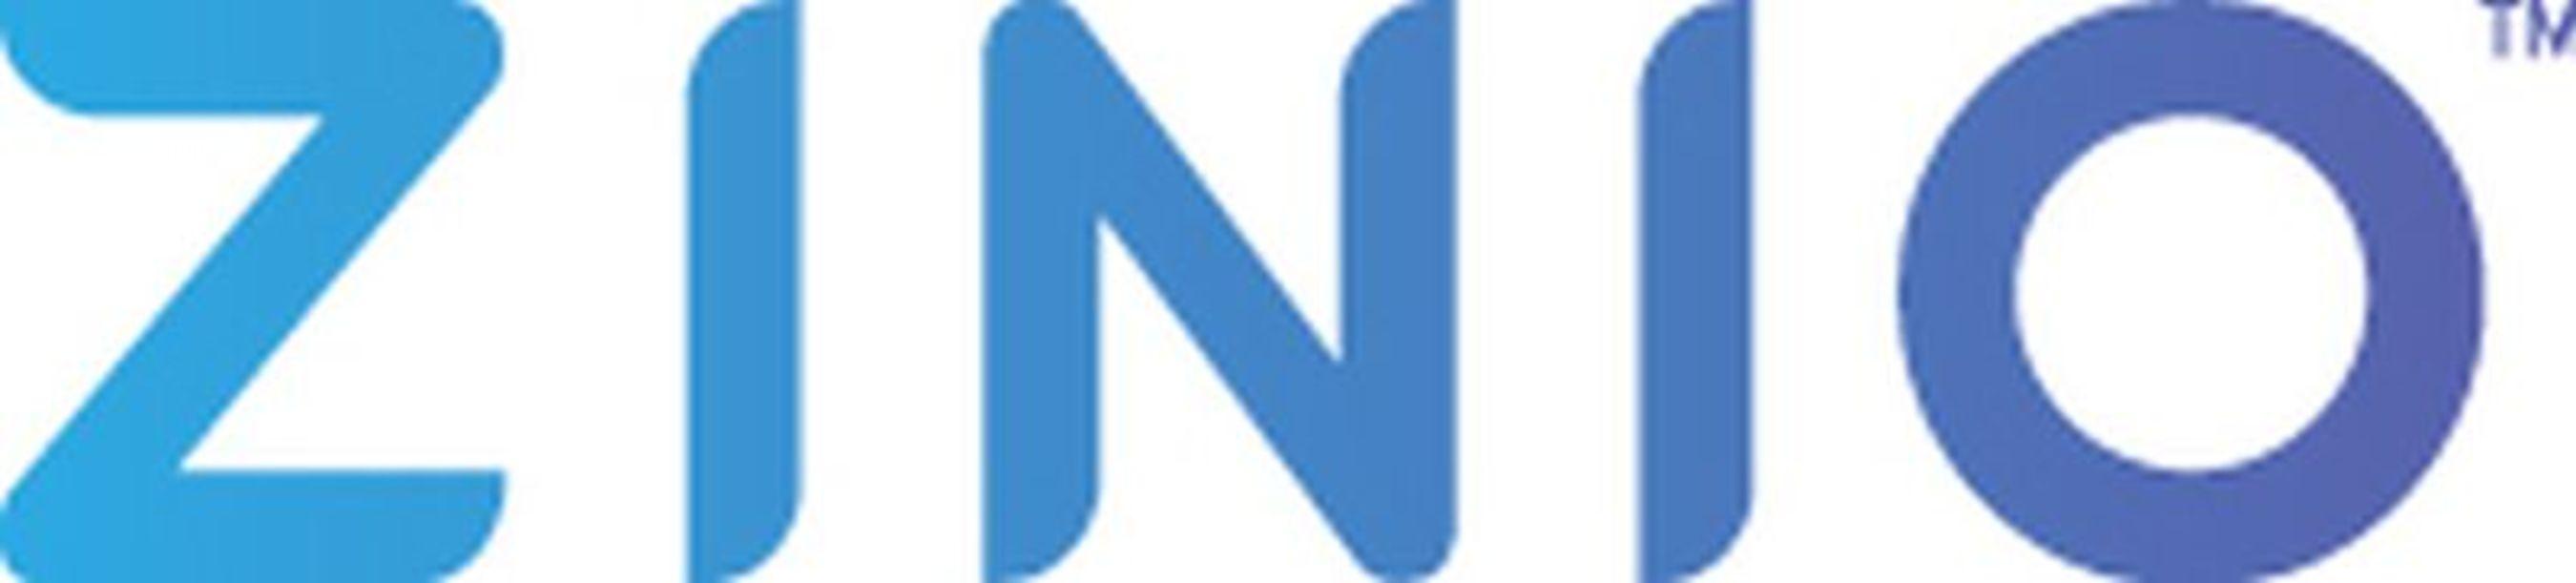 ZINIO Names Kelly Conlin as President and CEO